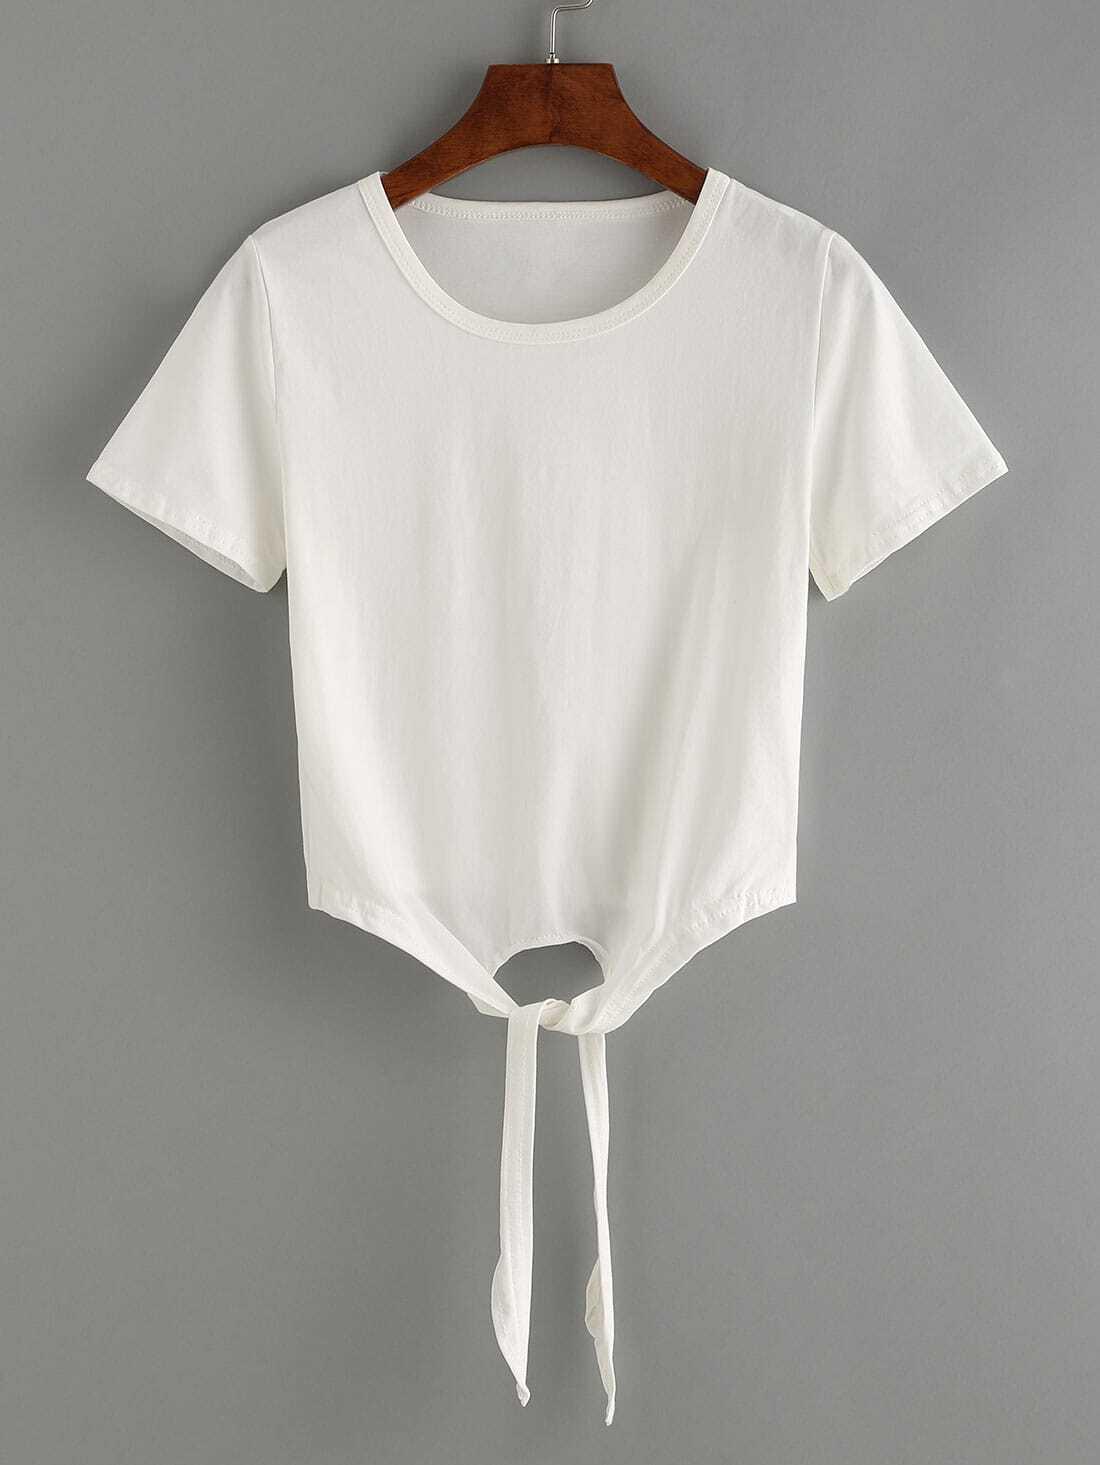 White Polo Shirt For Women